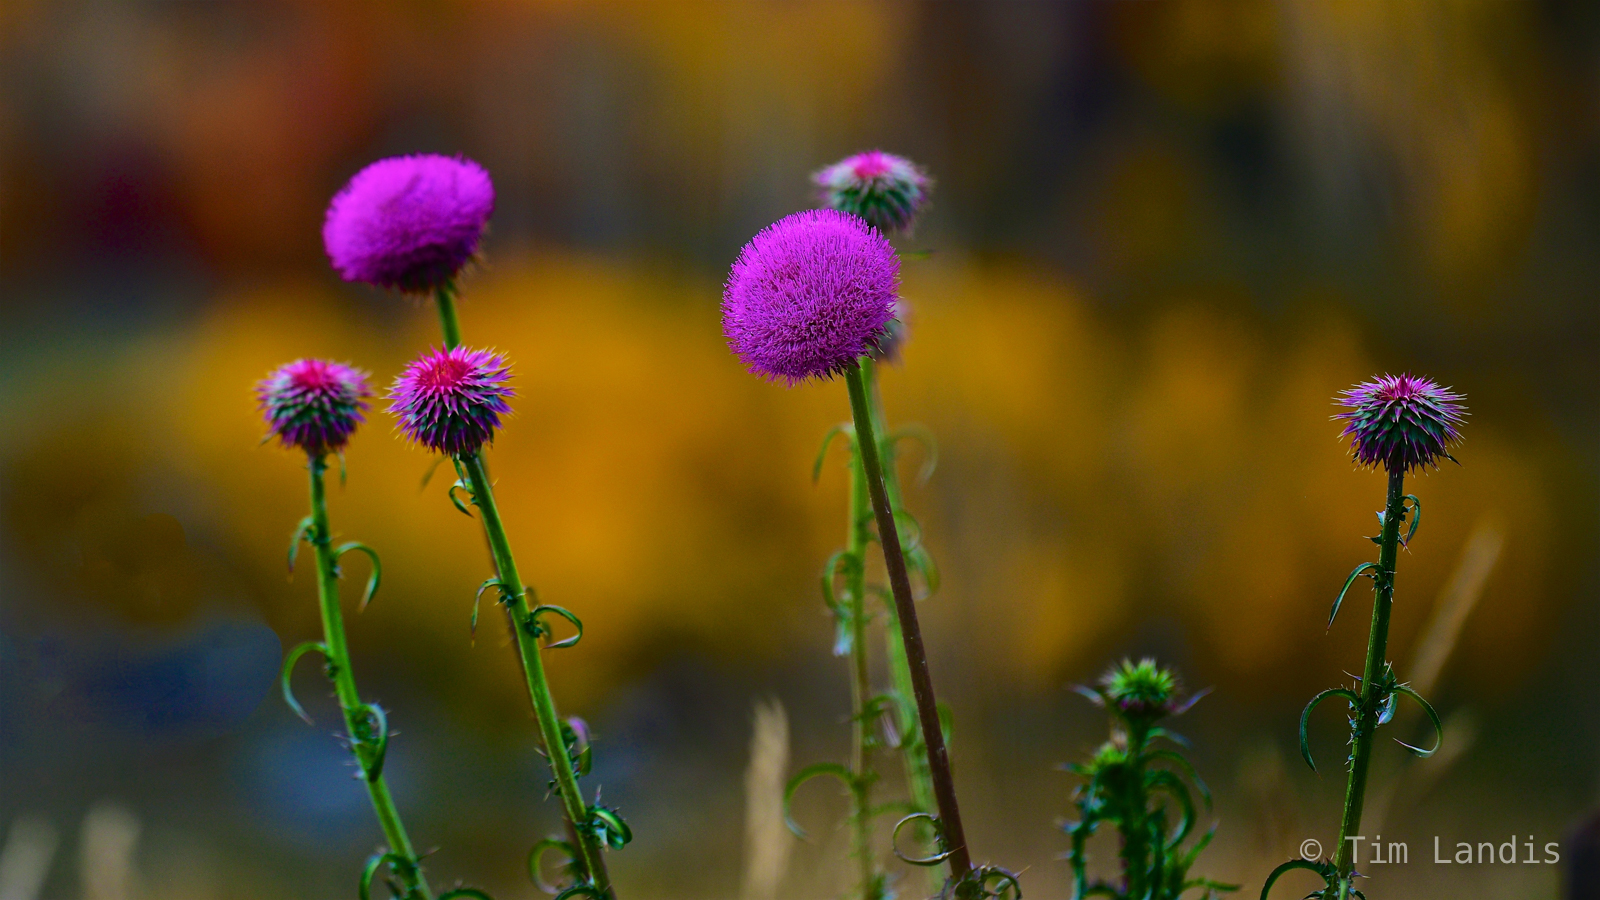 Magenta wild flowers against yellow aspens, photo